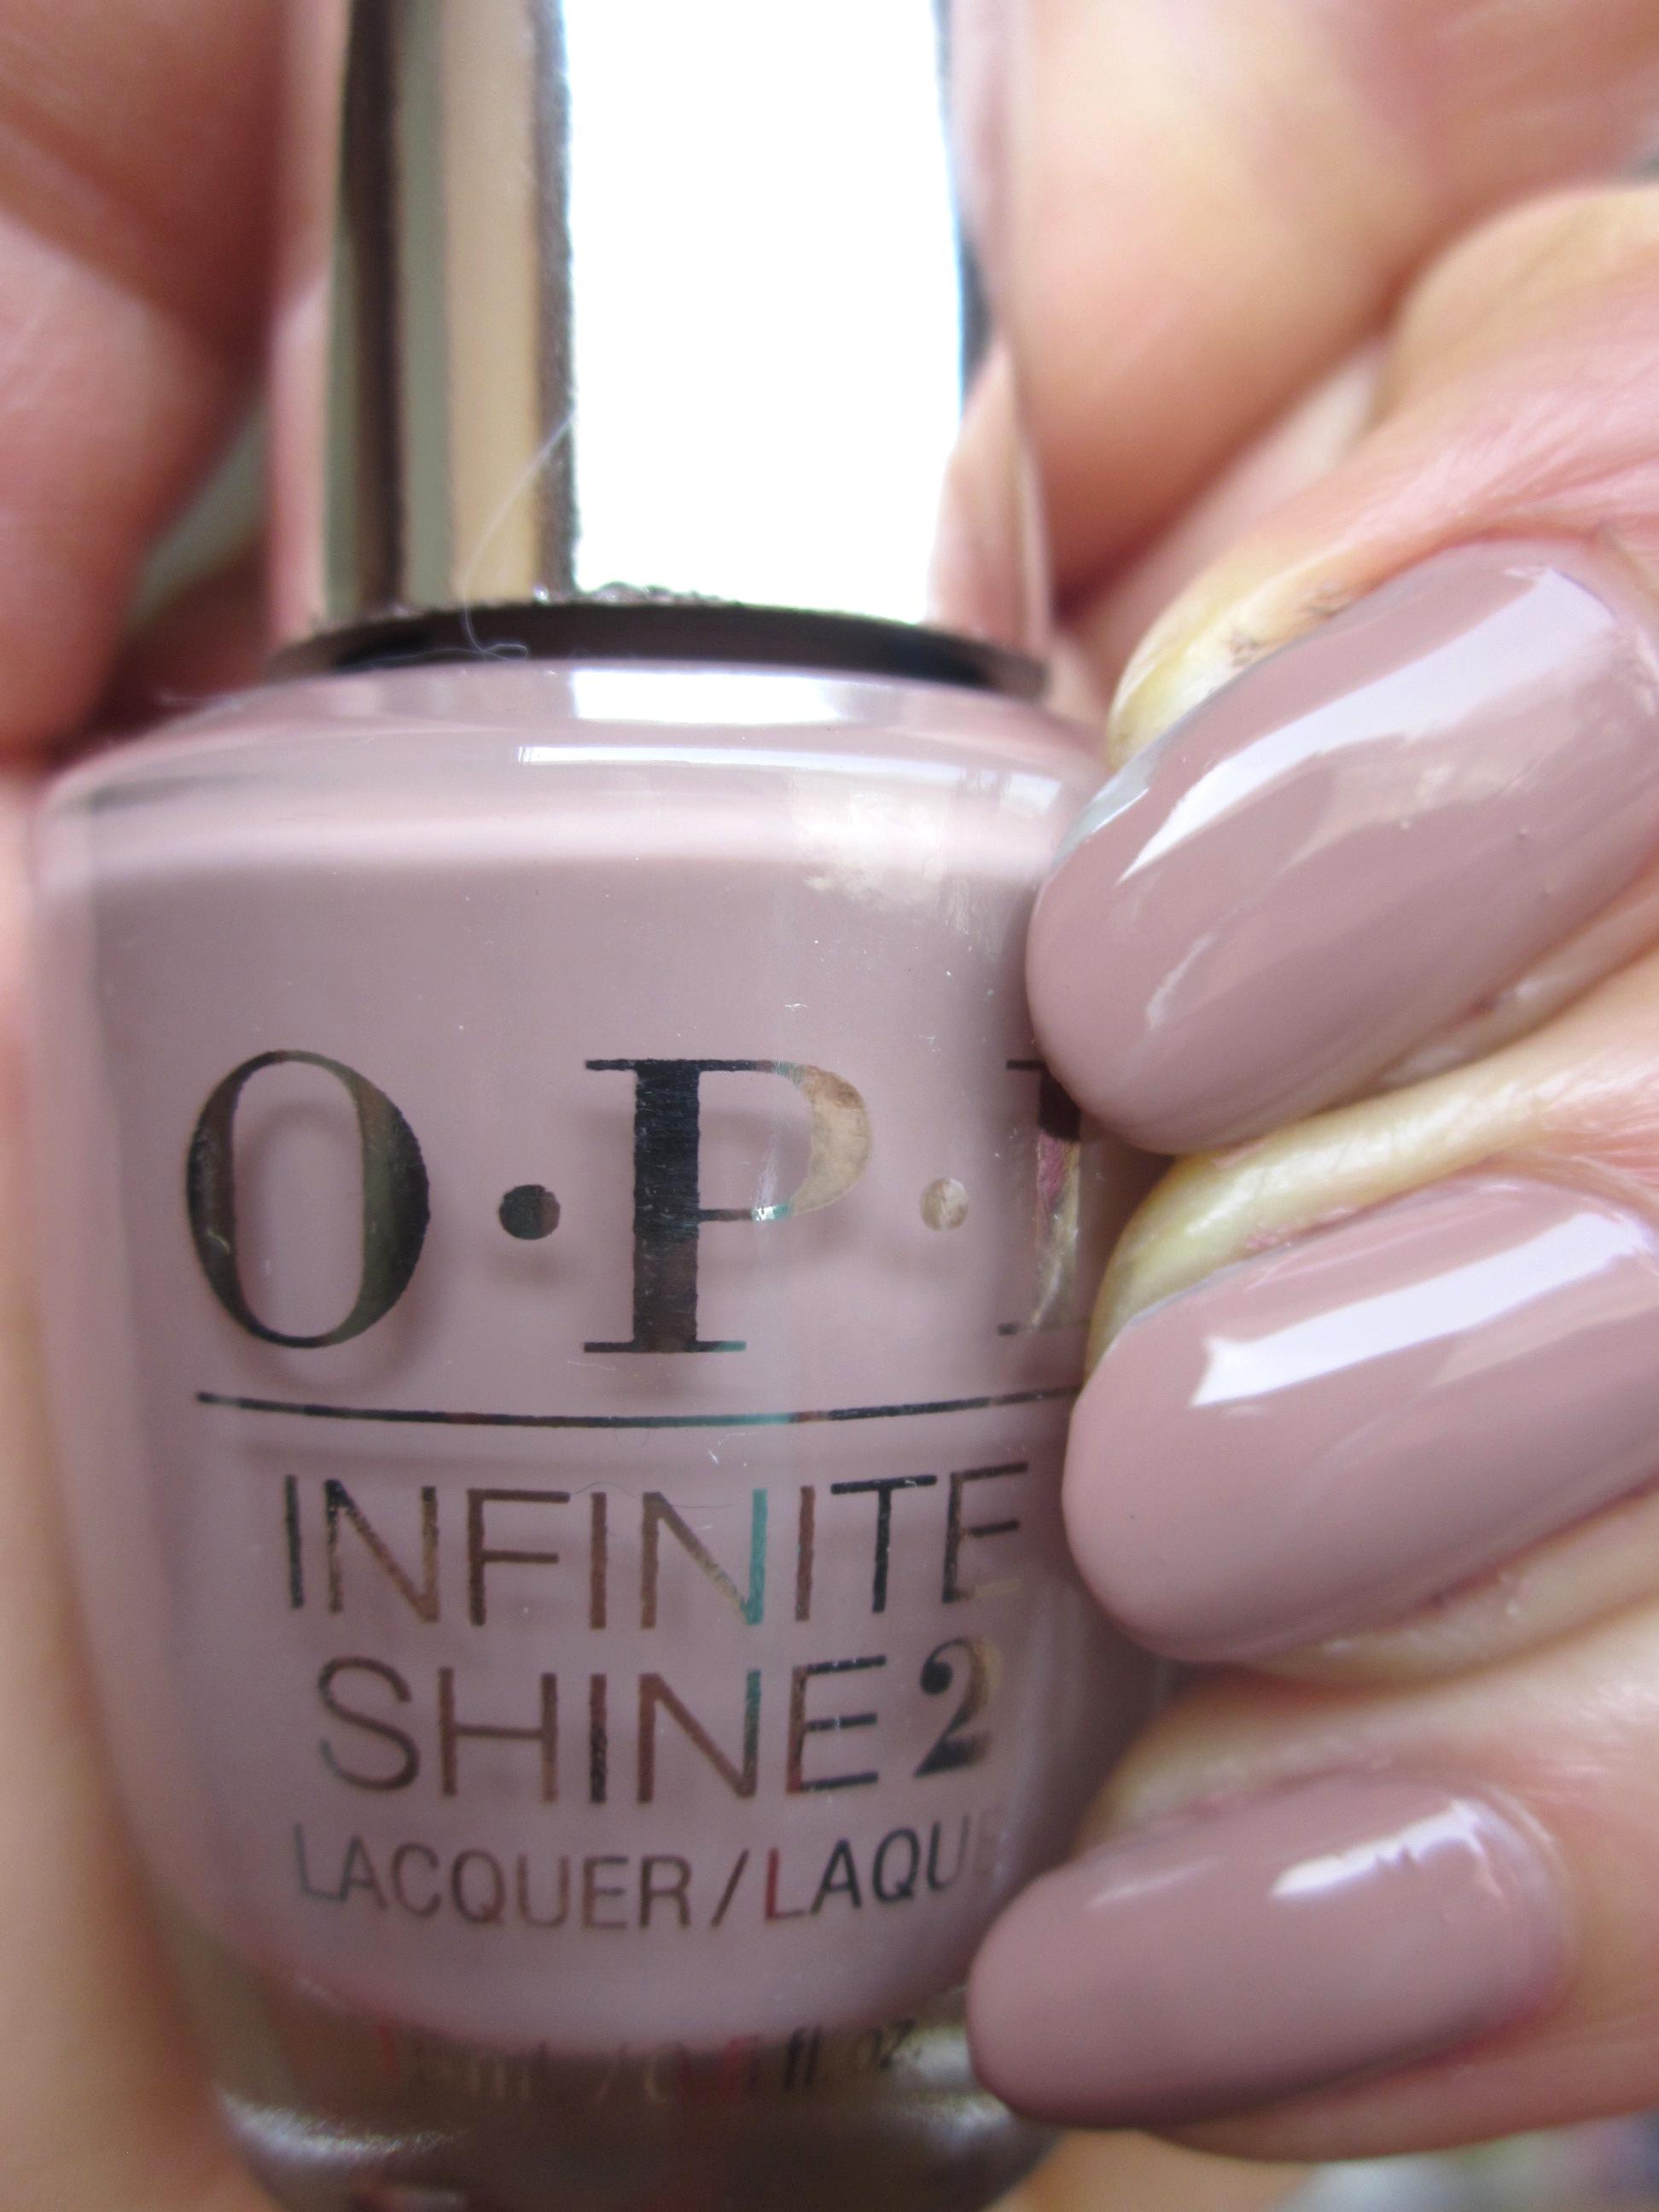 OPI INFINITE SHINE(インフィニット シャイン) IS-L29 It Never Ends(イット ネバー エンズ)